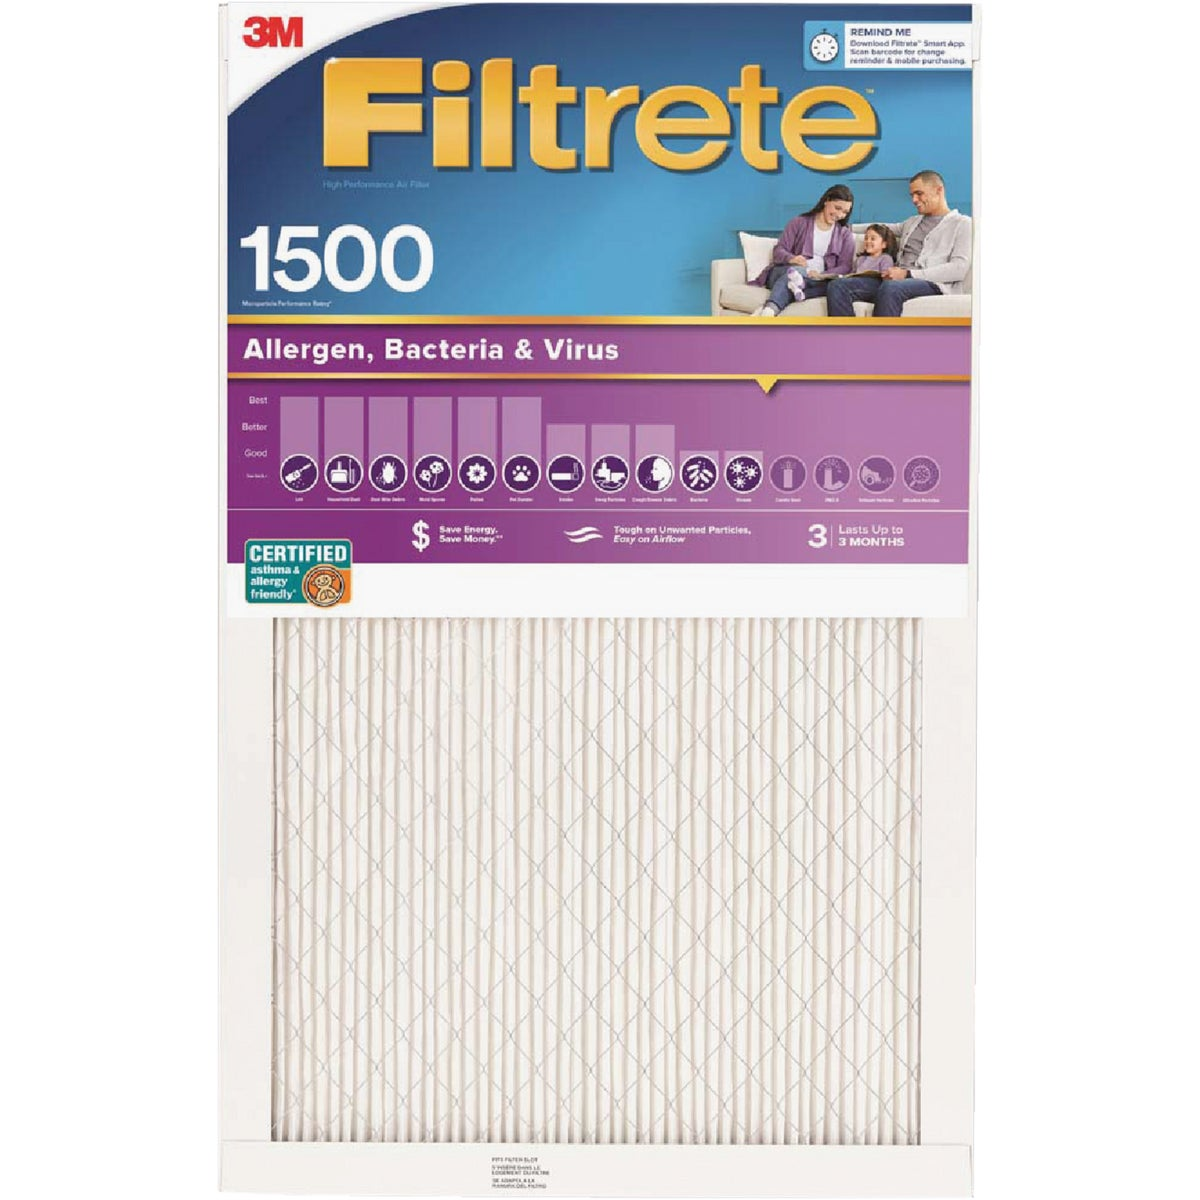 3M Filtrete 14 In. x 24 In. x 1 In. Ultra Allergen Healthy Living 1550 MPR Furnace Filter